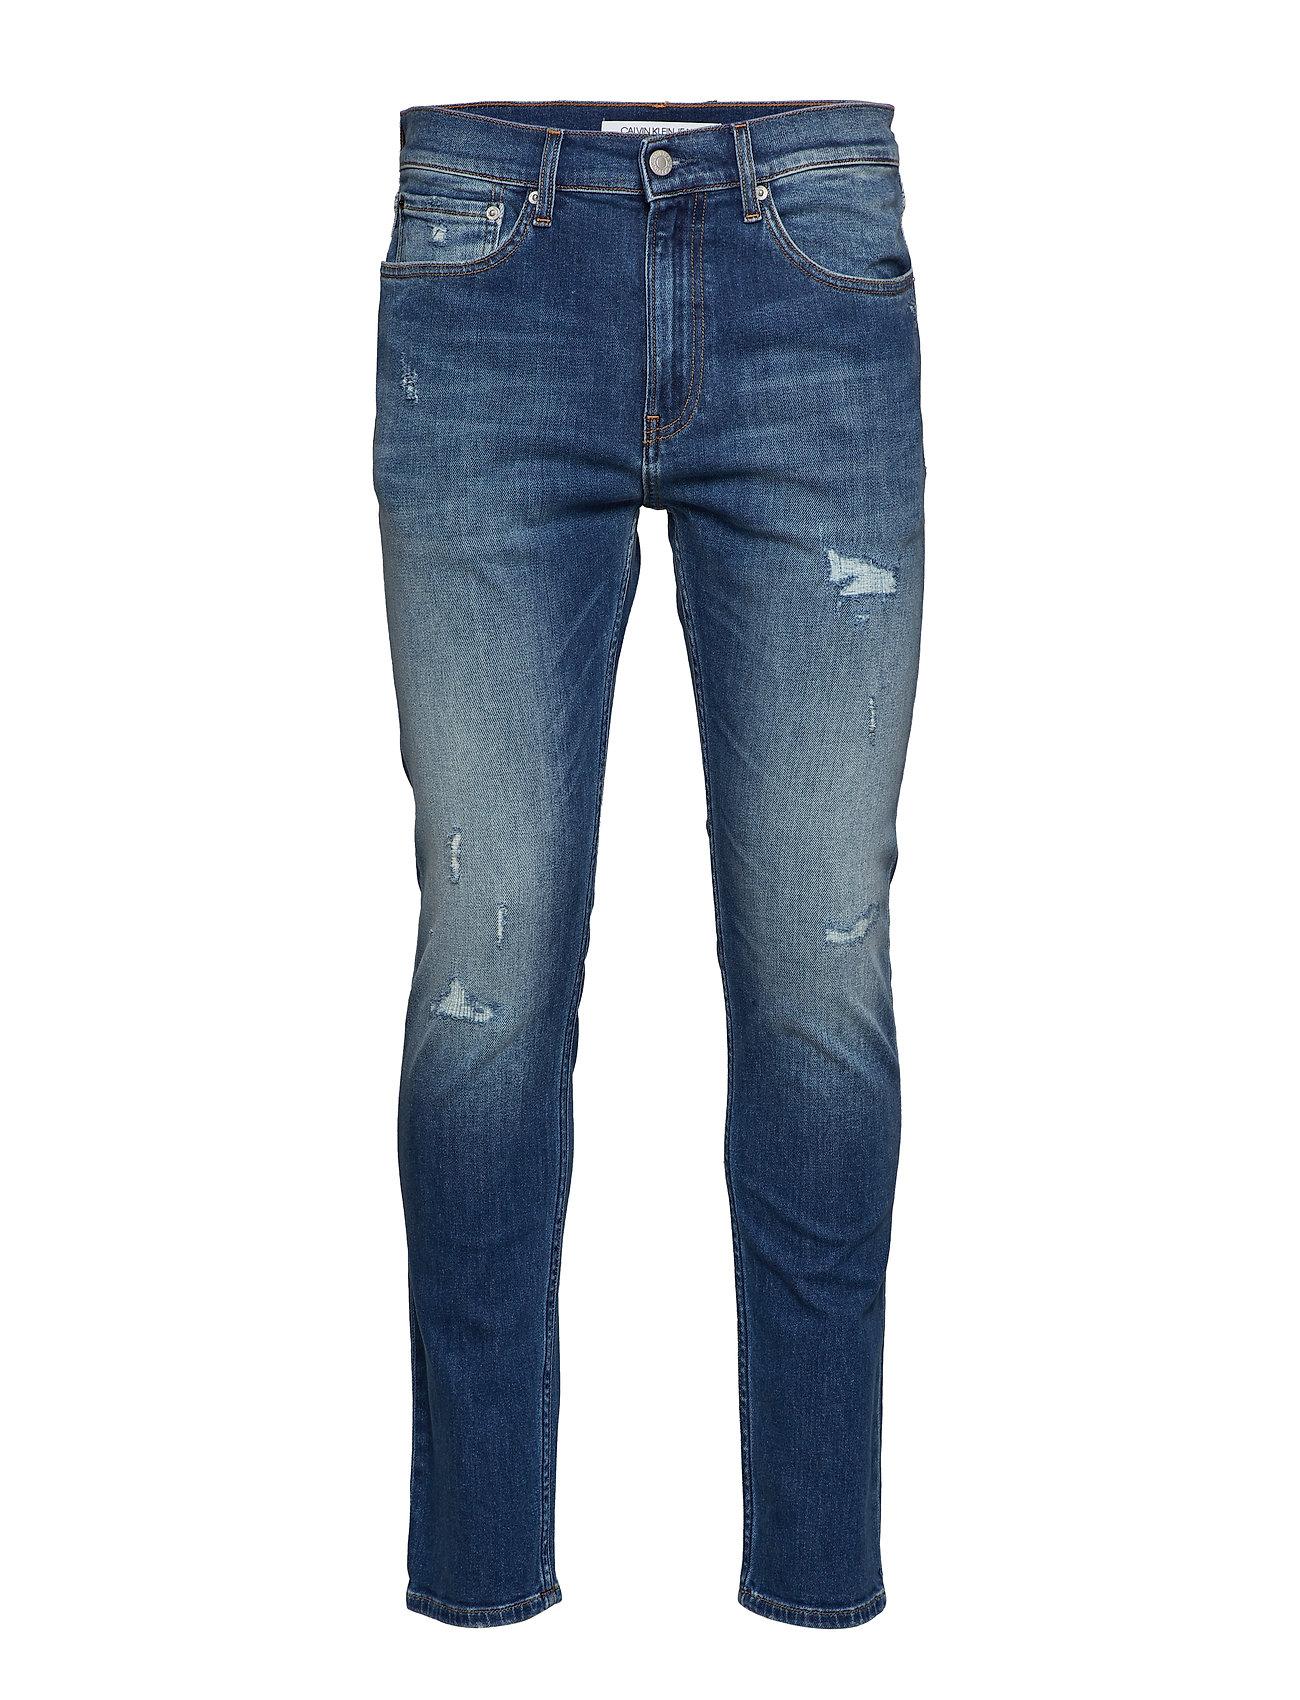 Skinnytartan BlueCalvin Klein Jeans Ckj 016 lcJTFK1